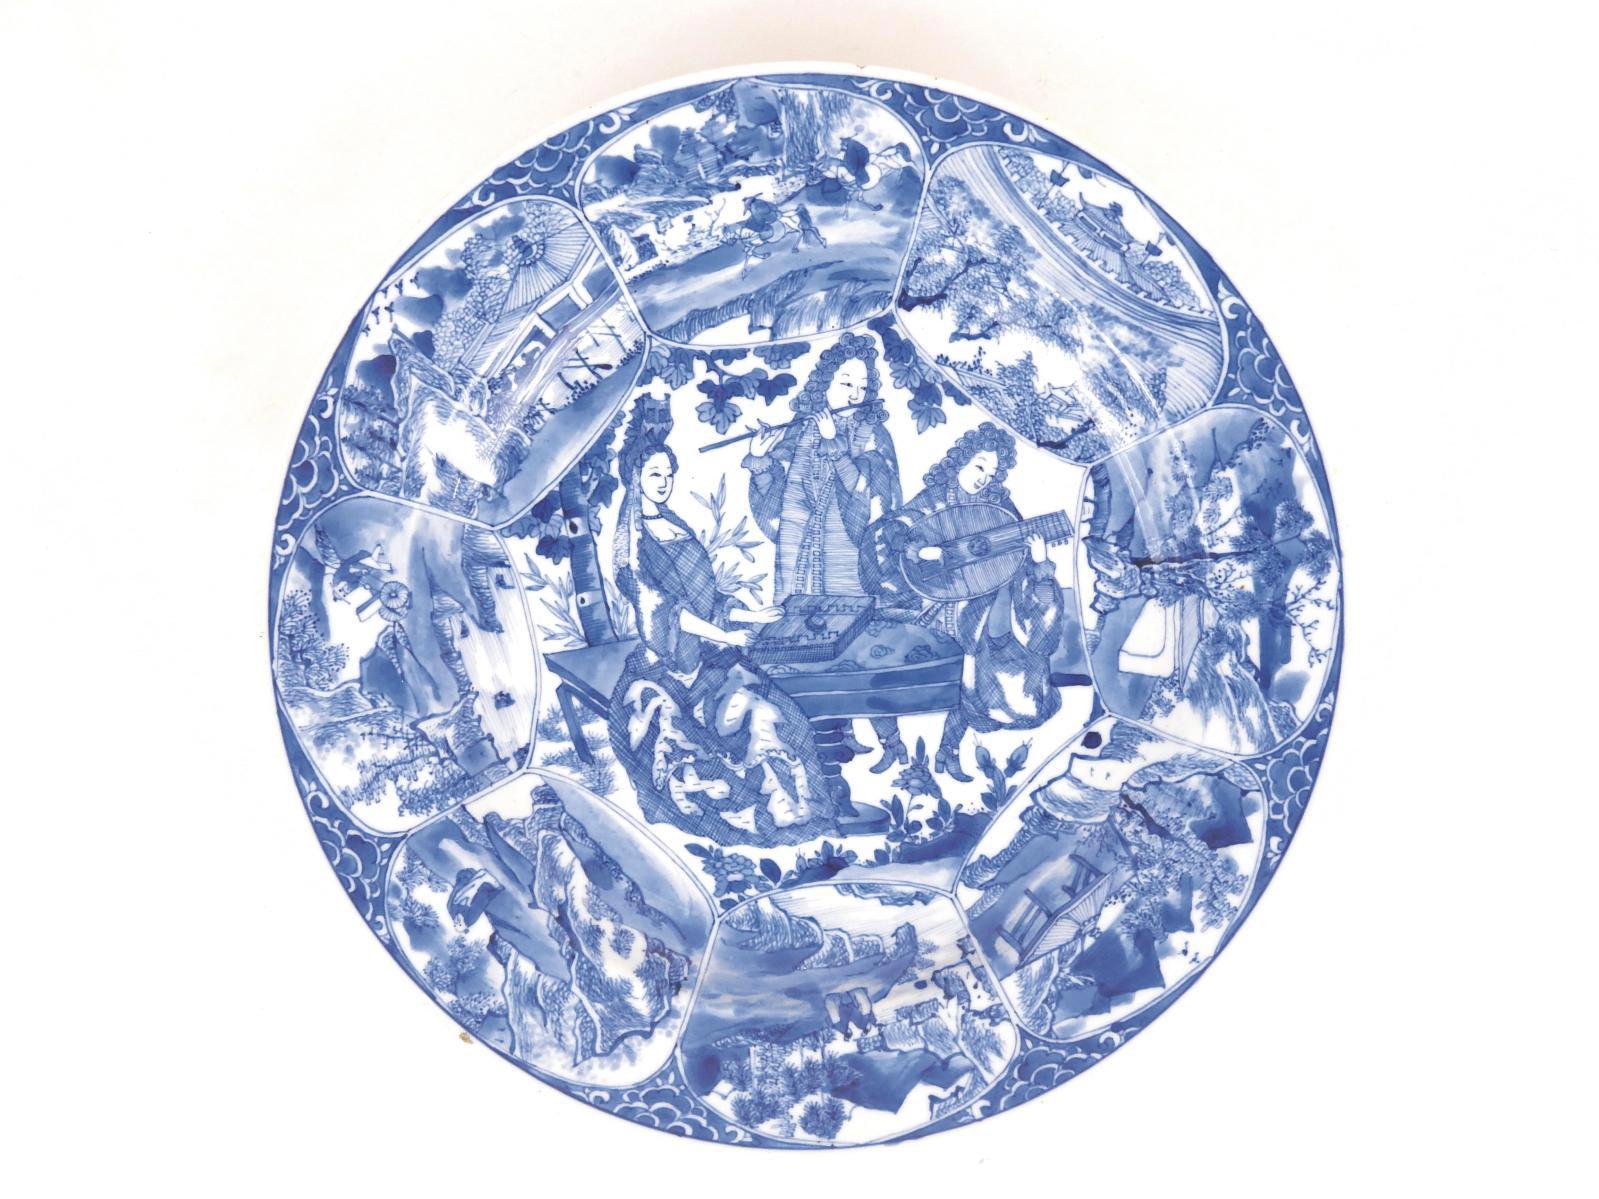 Chine, époque Kangxi (1662-1722)